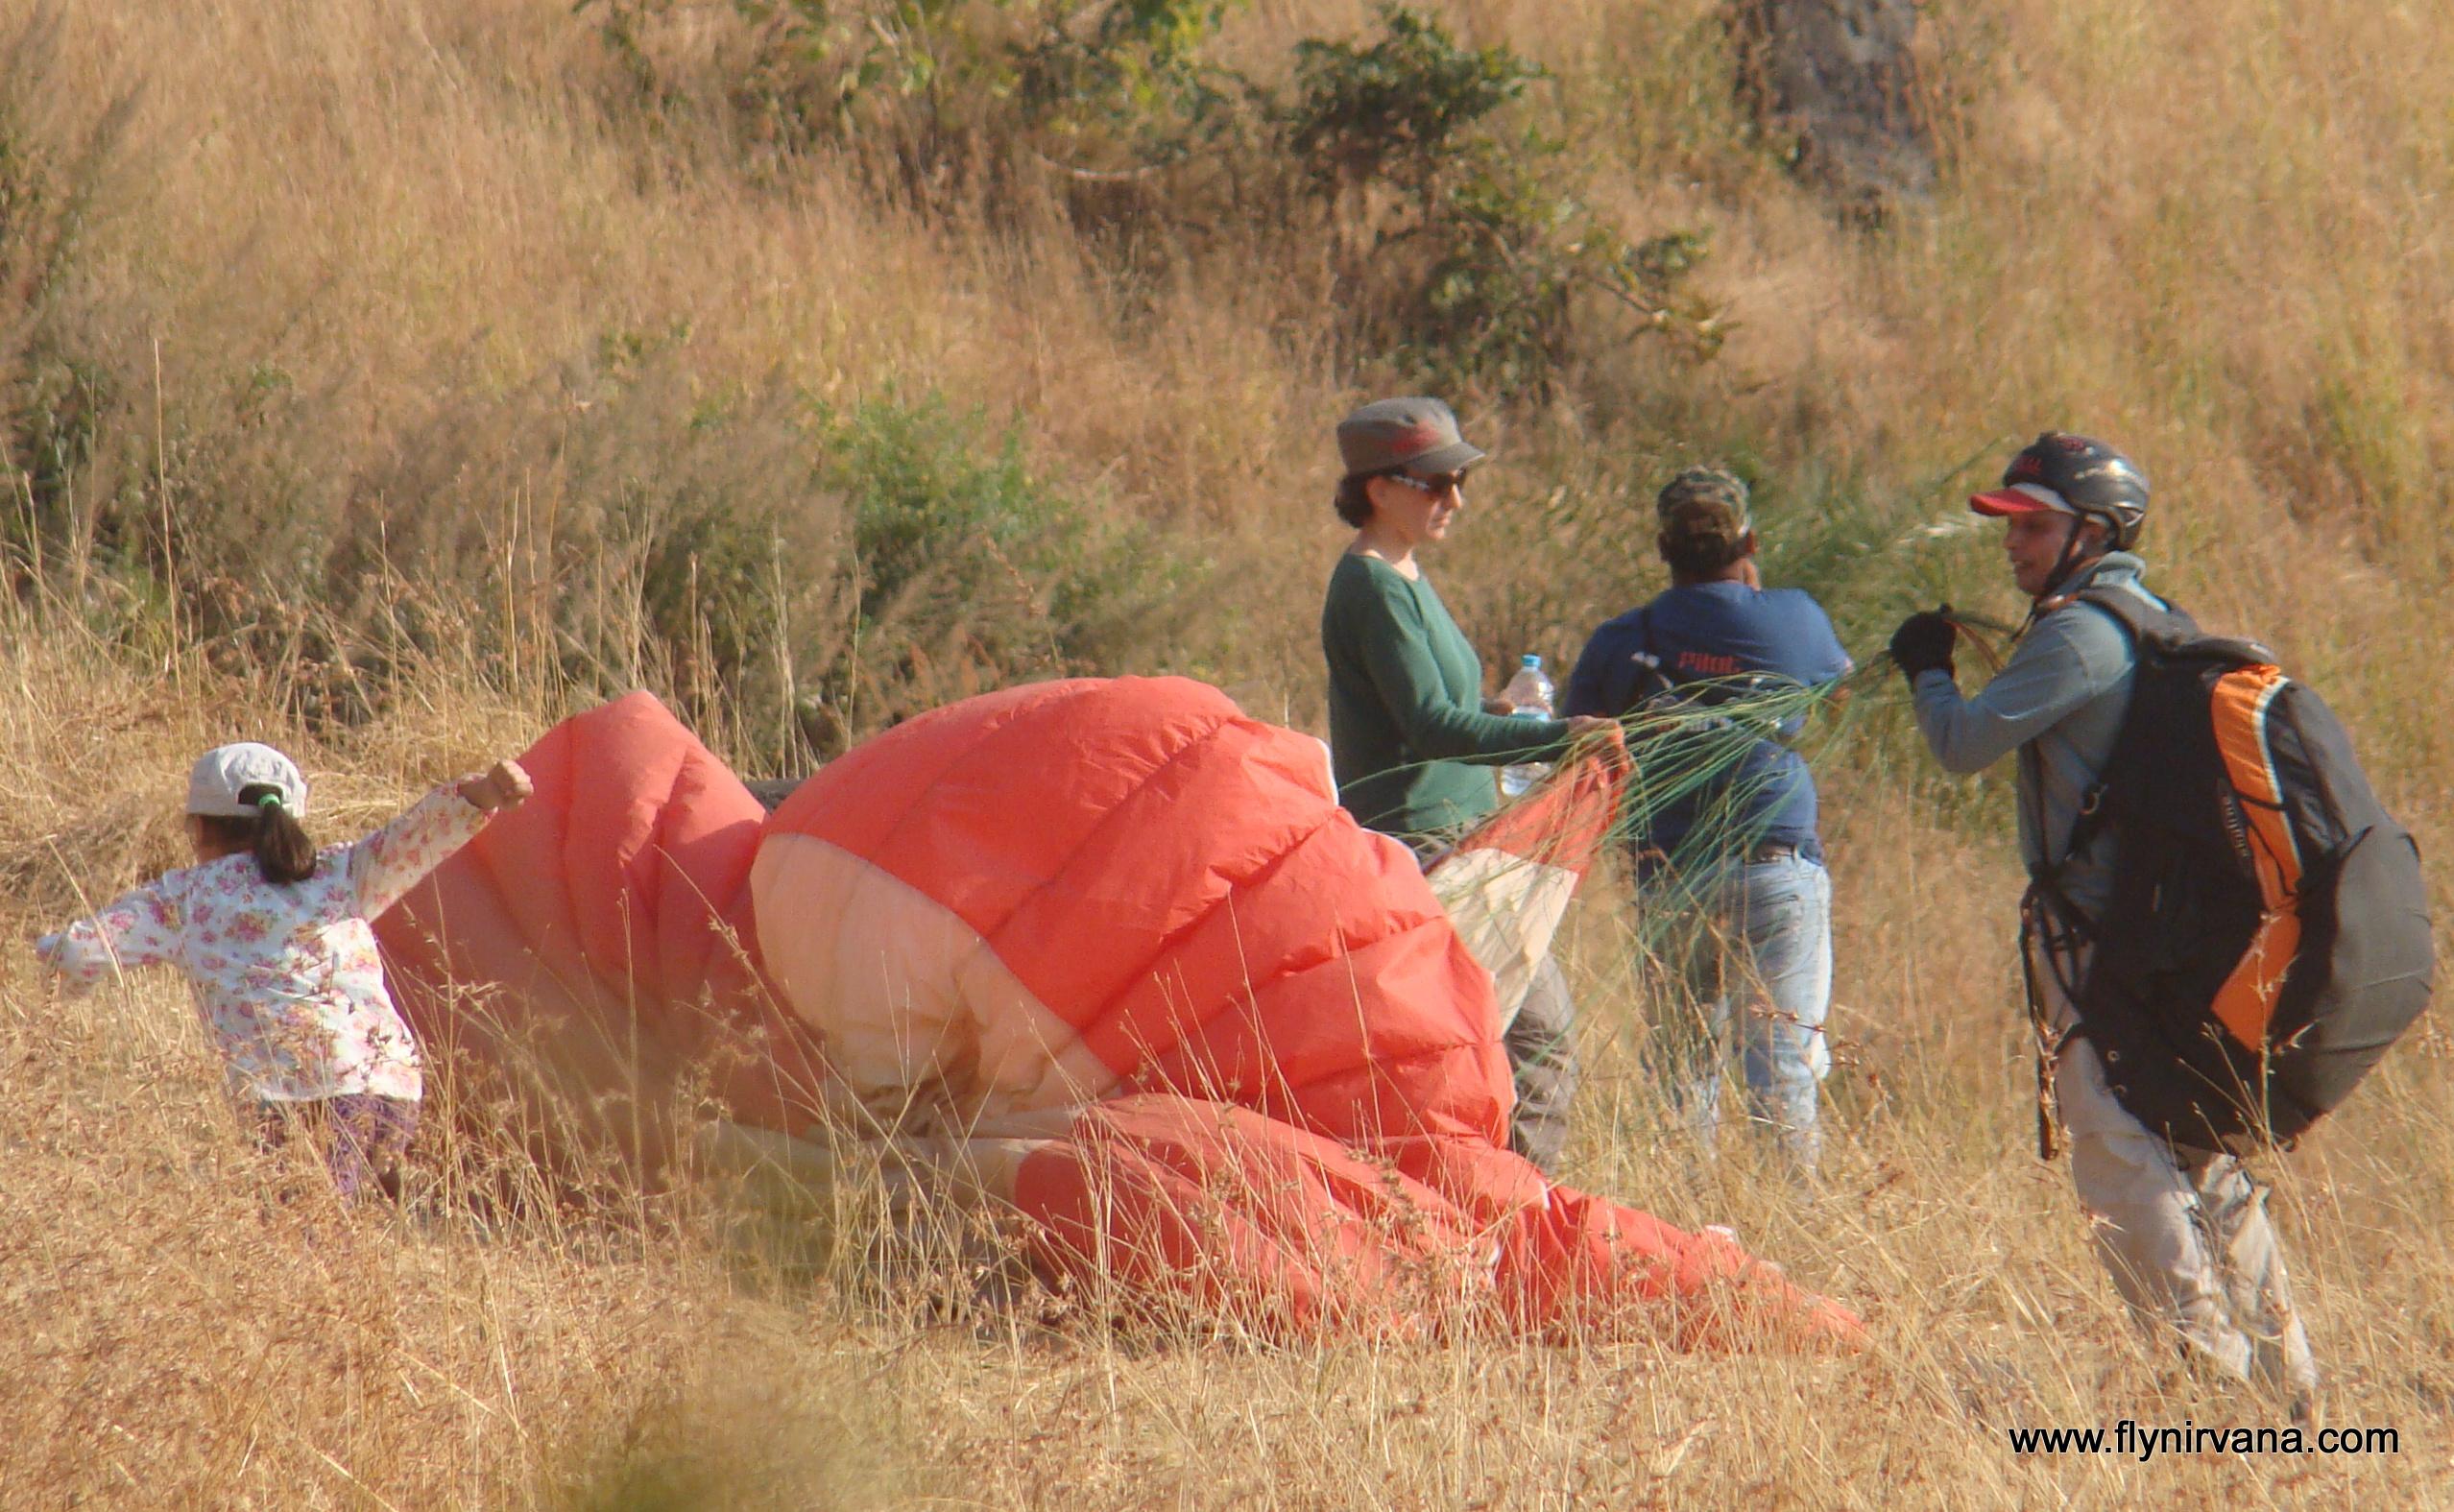 The FlyNirvana Team welcomes the Suryavanshi family  back to the Kamshet skies